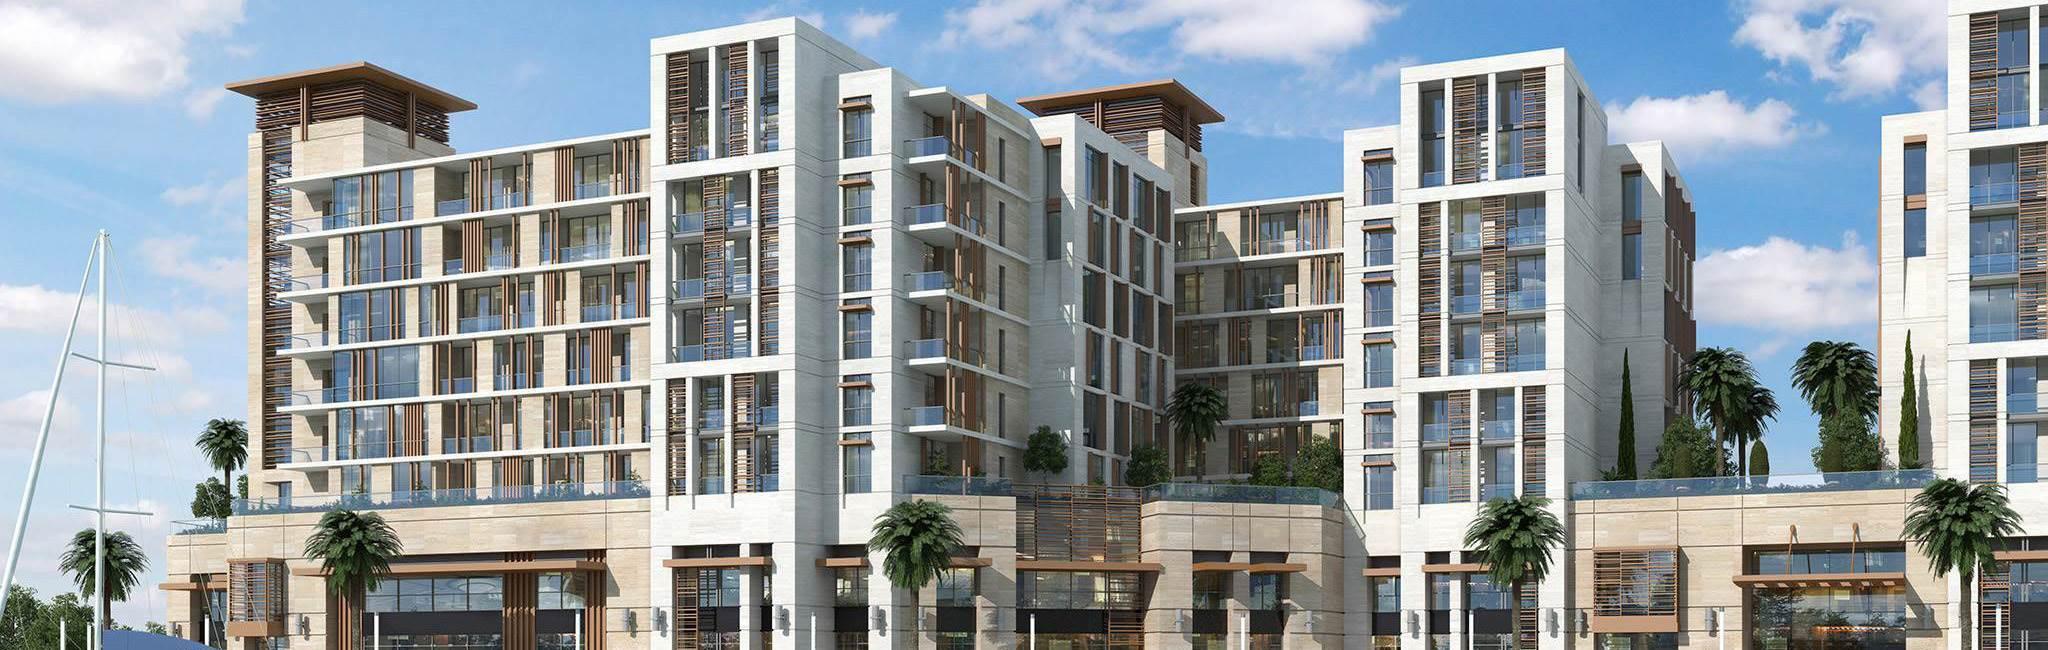 Dubai Wharf Luxury Apartments From Aed 937 000